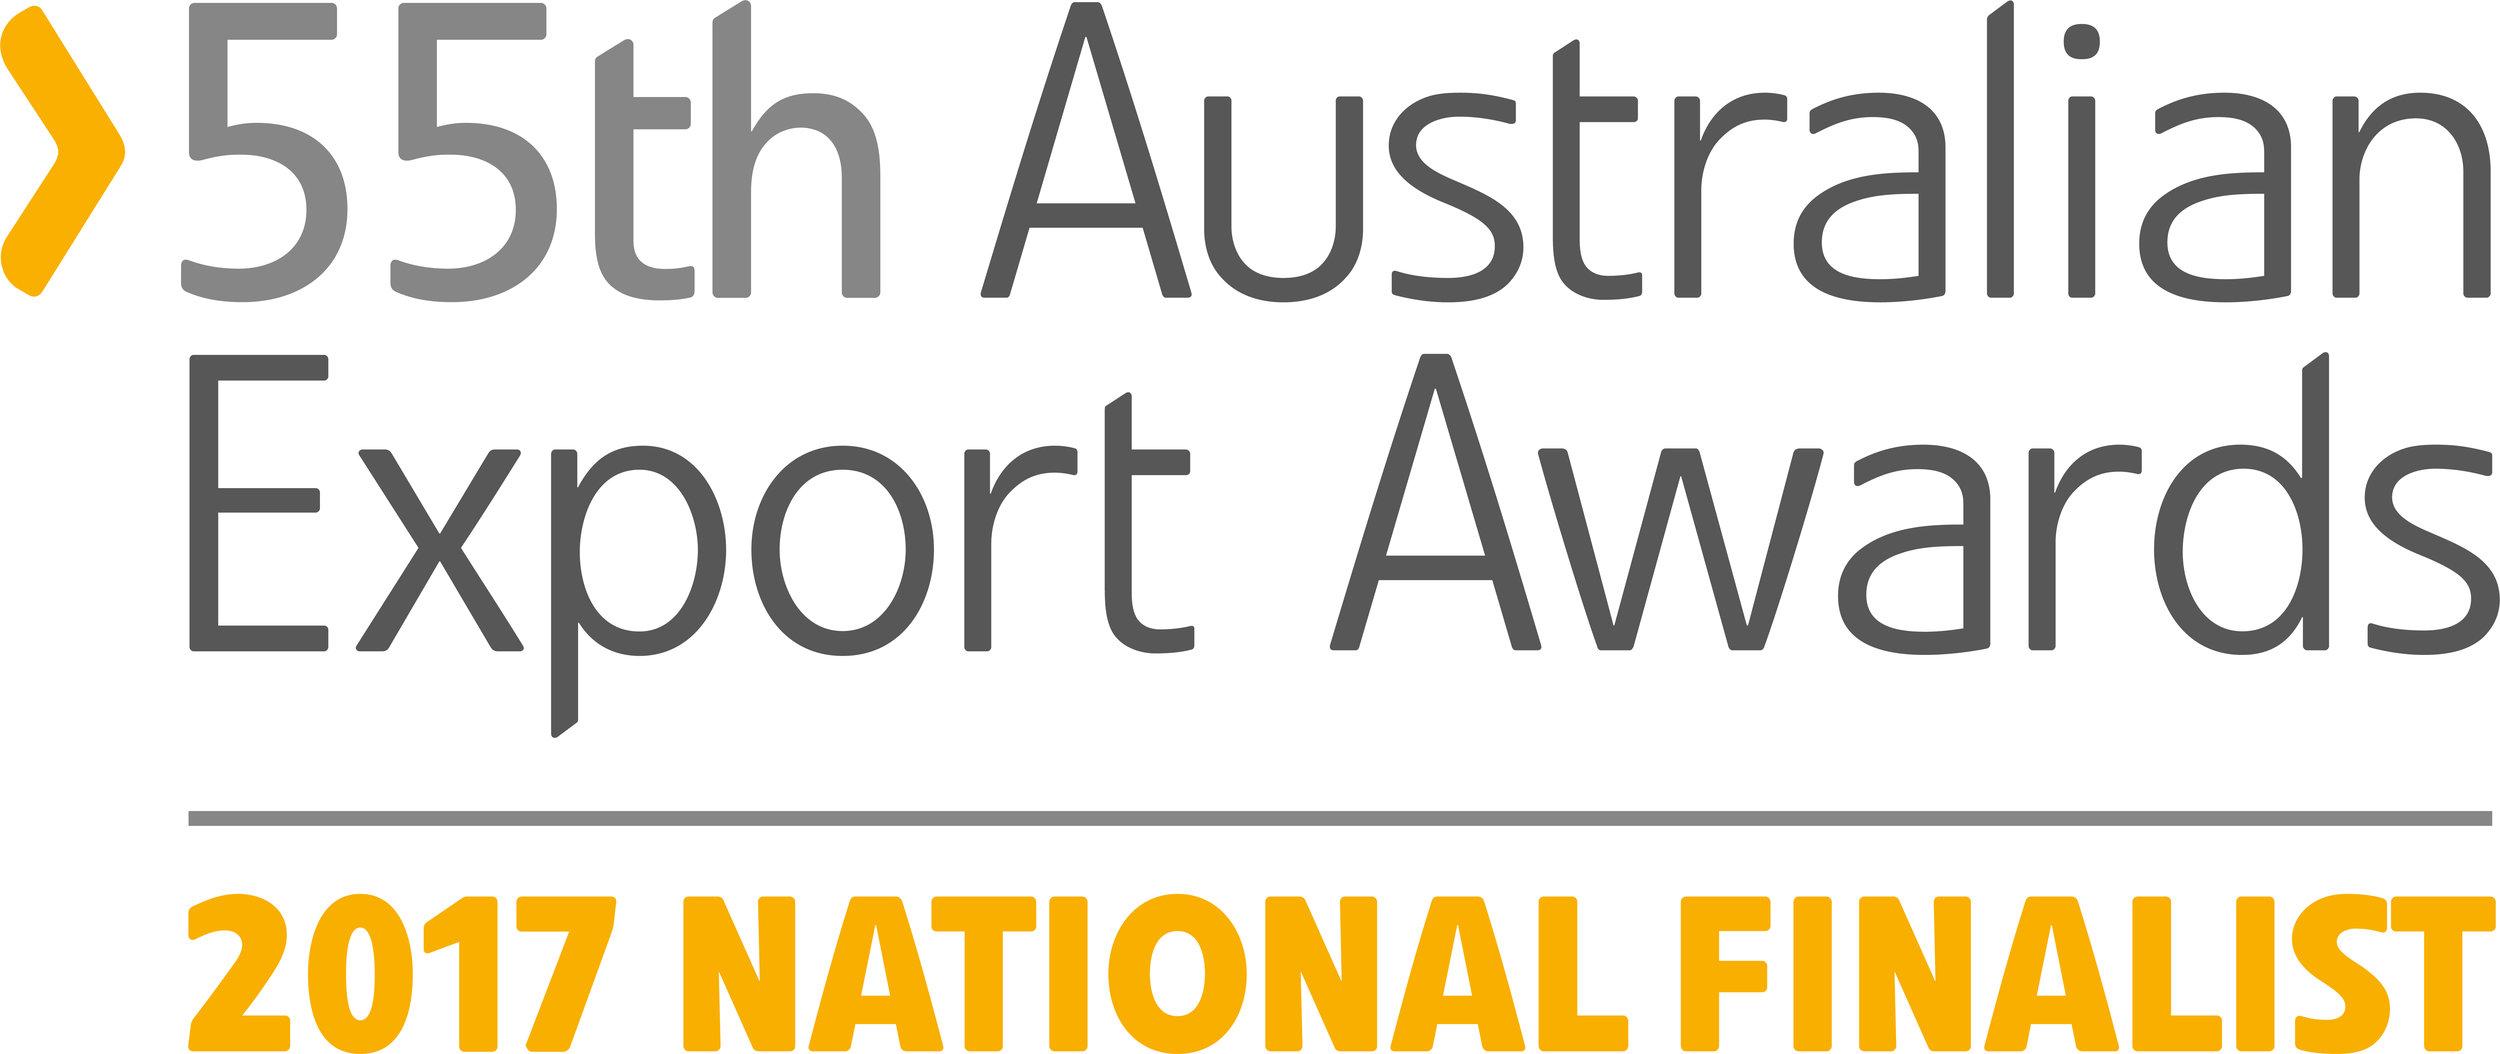 55thExportAwards_Logo_RGB(finalist).jpg